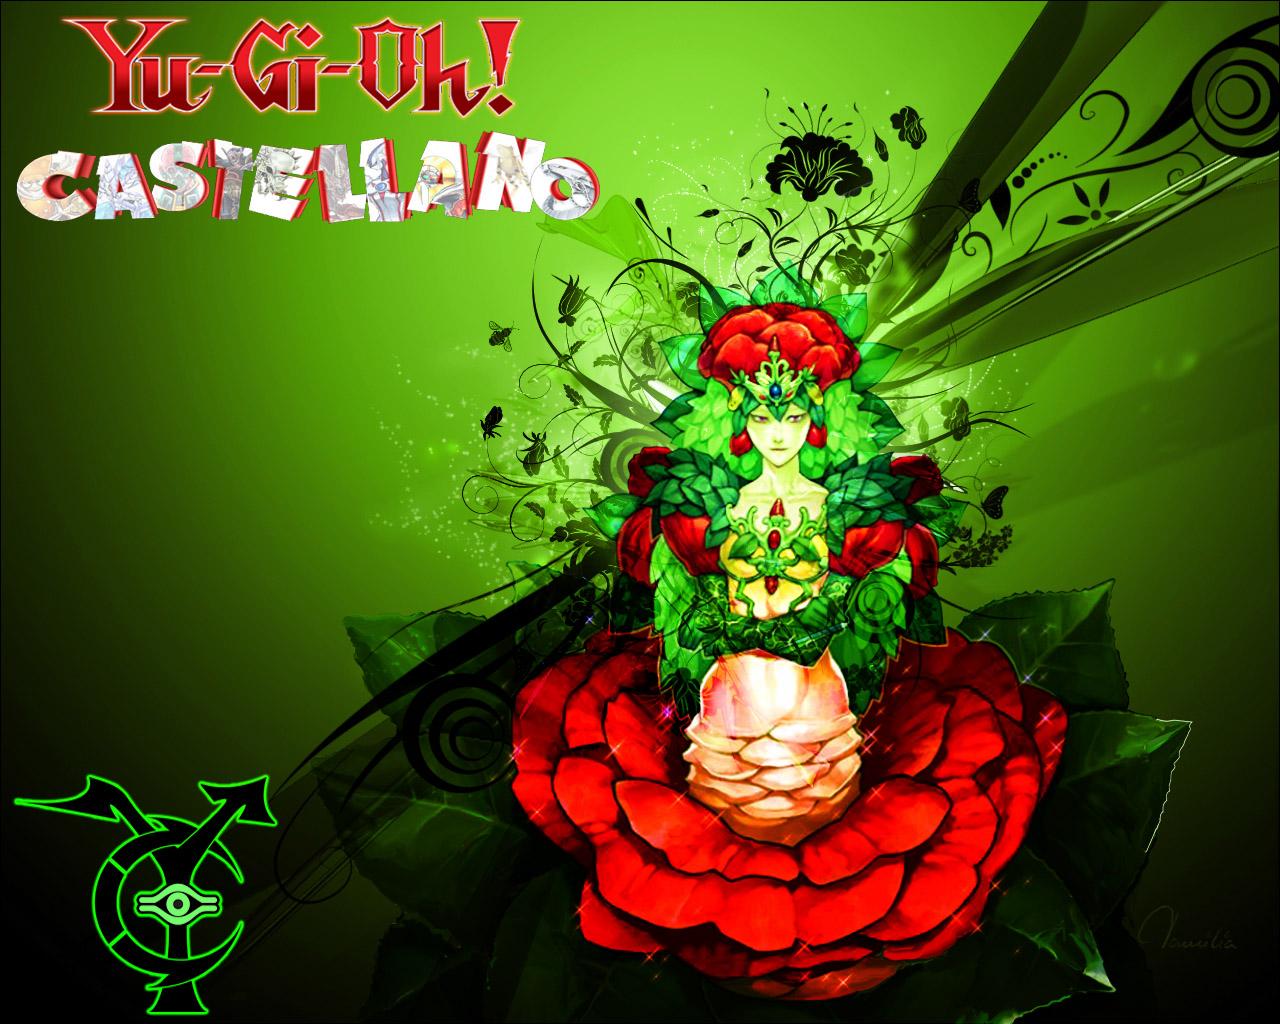 http://1.bp.blogspot.com/_6S4w9nznjME/TJxMINEyrvI/AAAAAAAAAFI/L2jbz3VoK44/s1600/Vector_C4D_Wallpaper_green_by_Tamggggilia.jpg